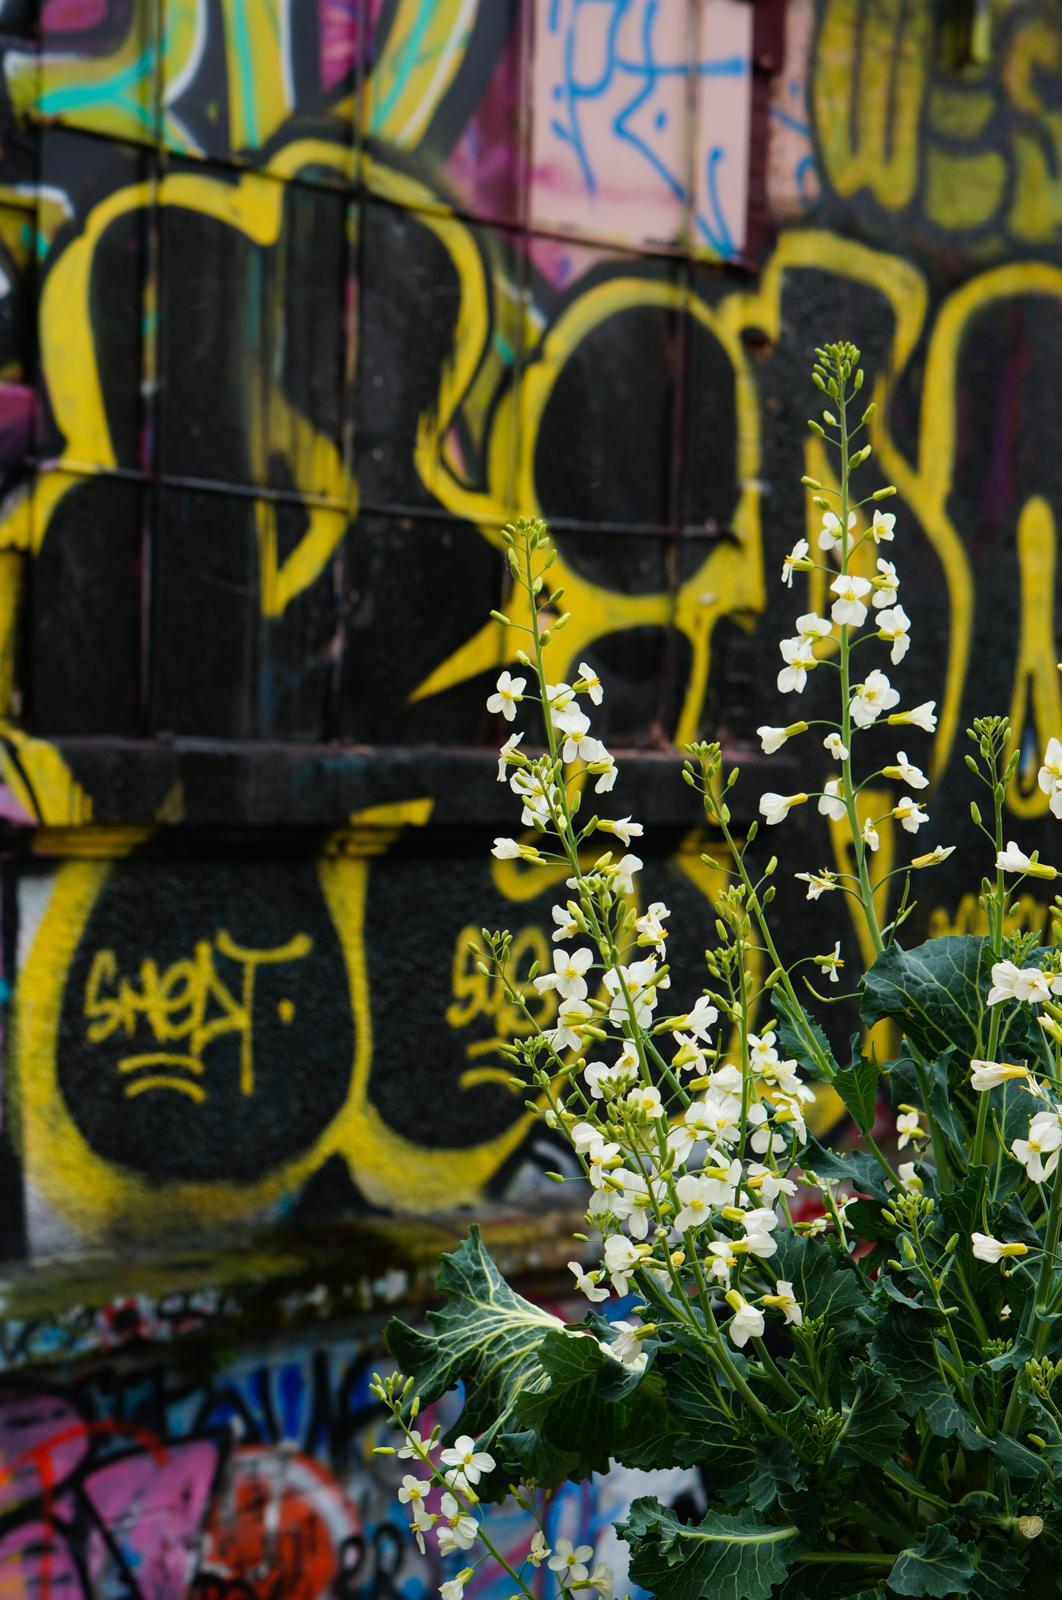 paris 20, balade paris 20, paris underground, paris alternatif, paris insolite, découvrir paris 20, que faire paris 20, balade originale paris 20, paris street art, street art paris 20